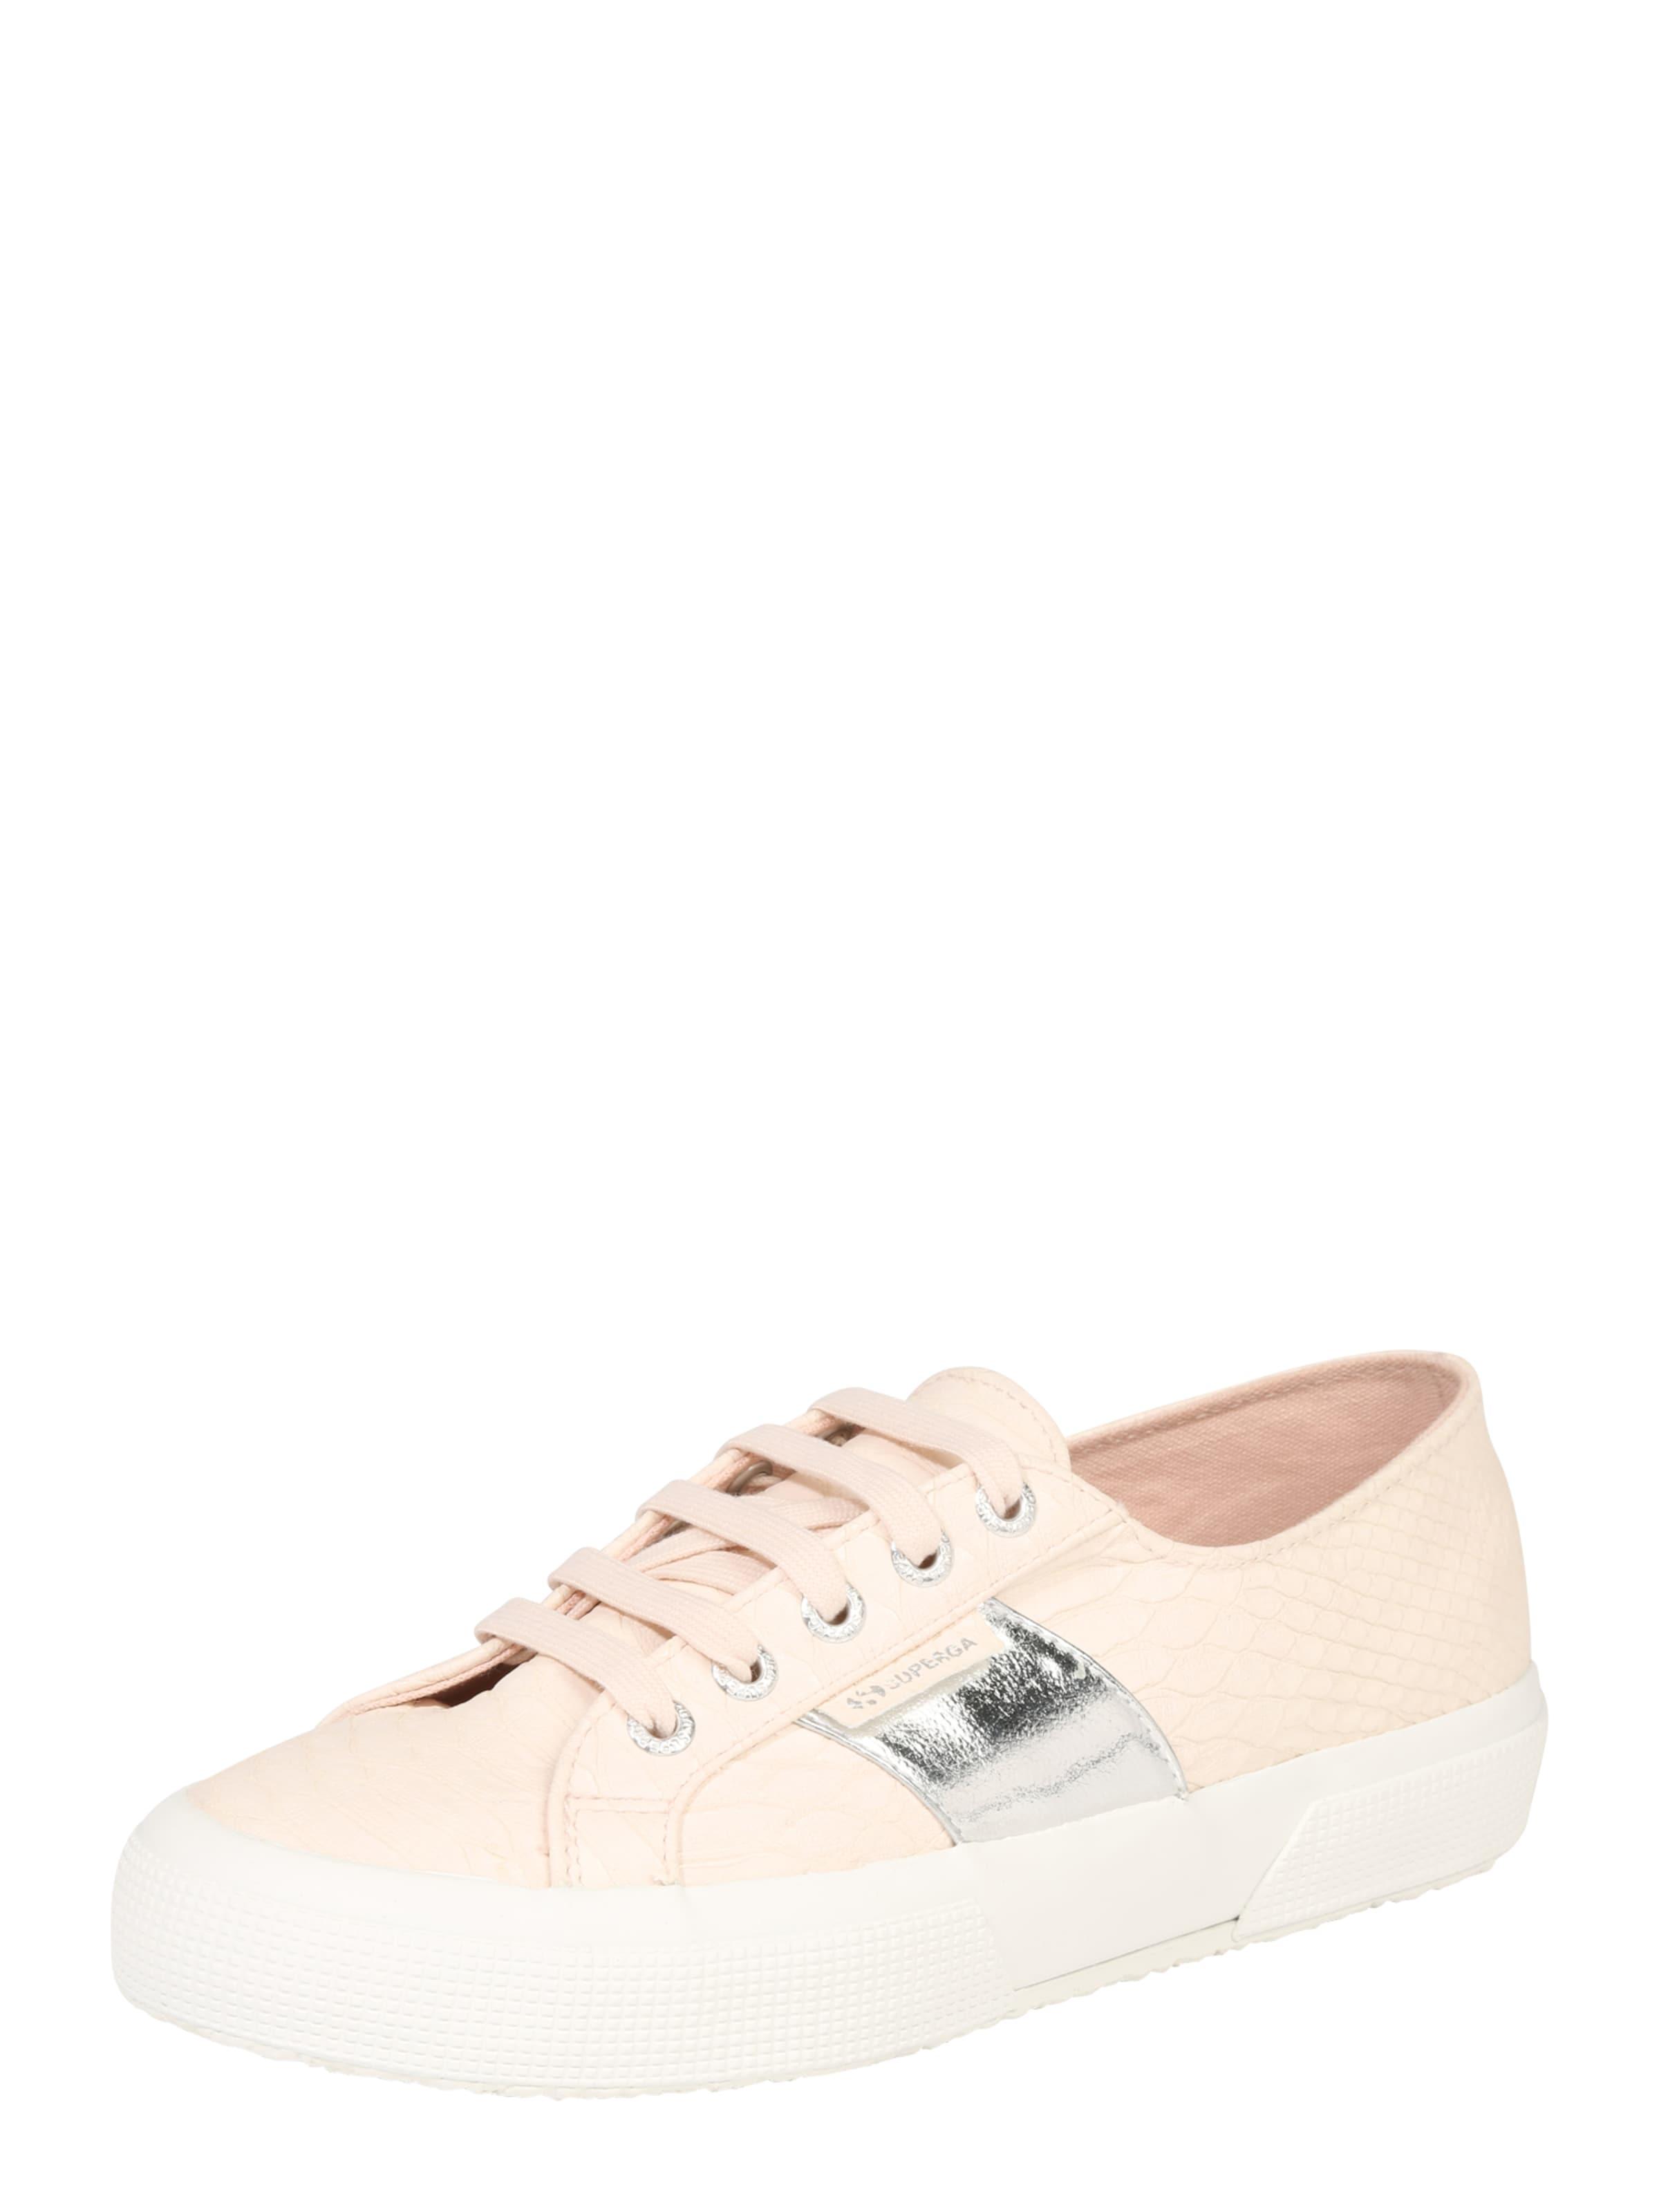 SUPERGA Sneakers Pusnakew mit Animal-Optik Hohe Qualität